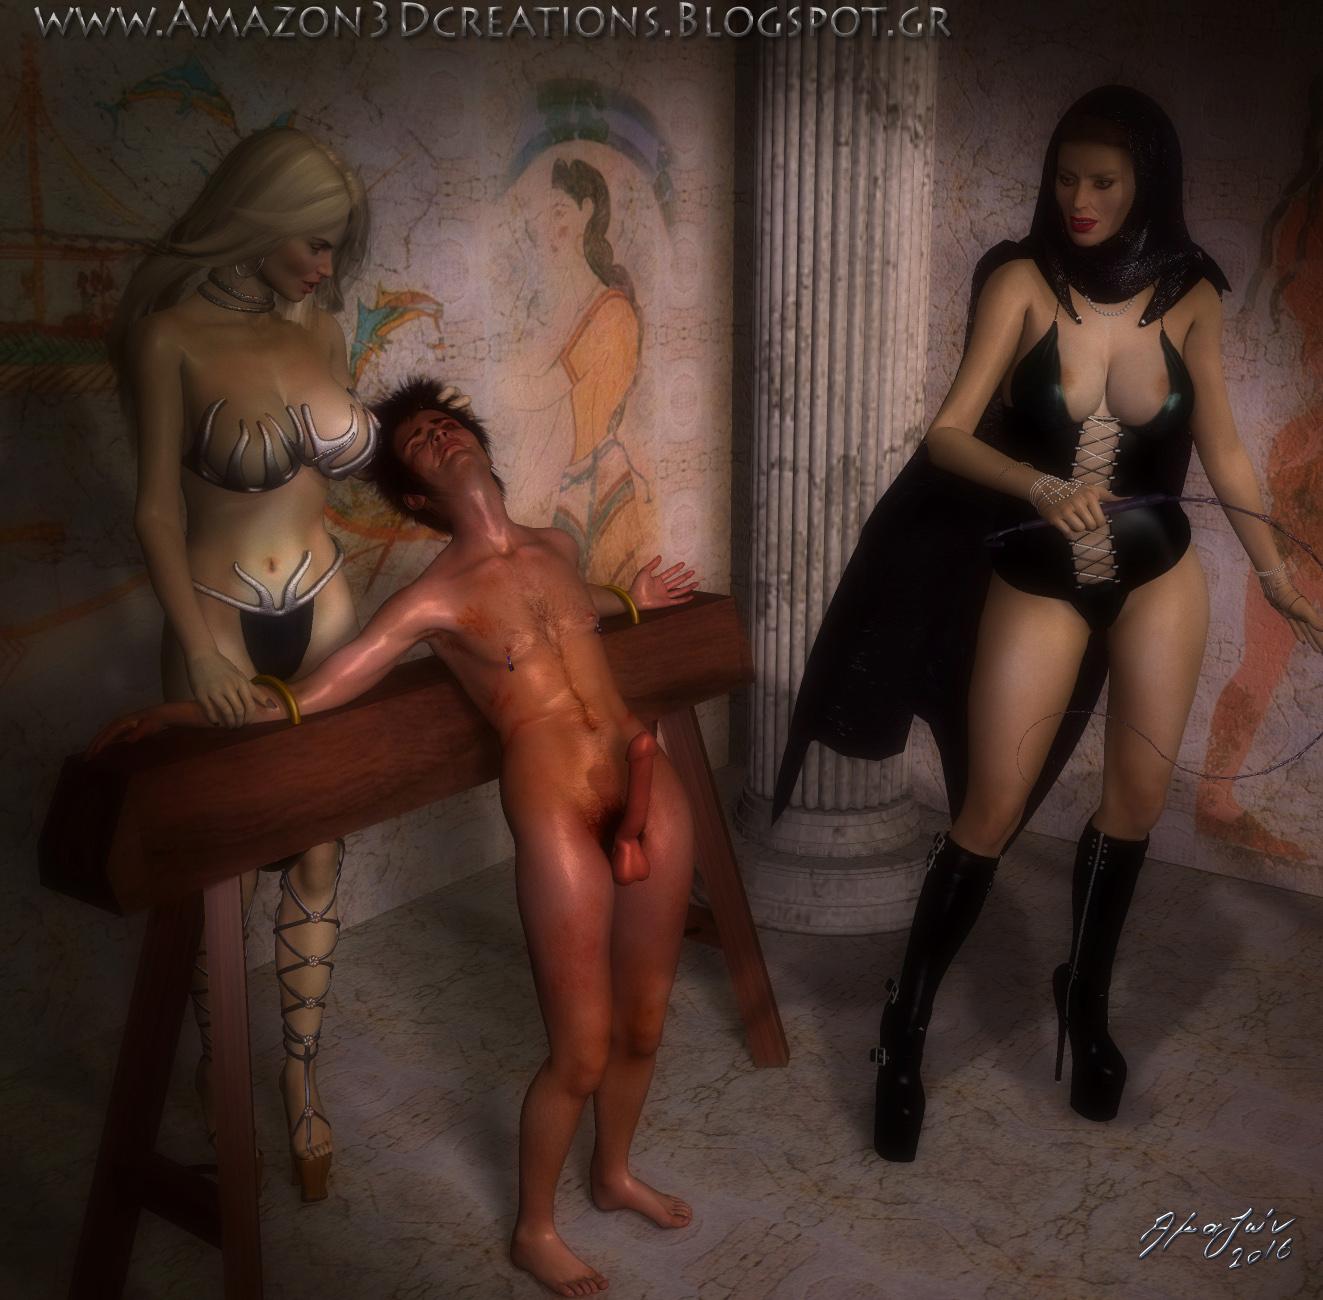 3d femdom art by amazon